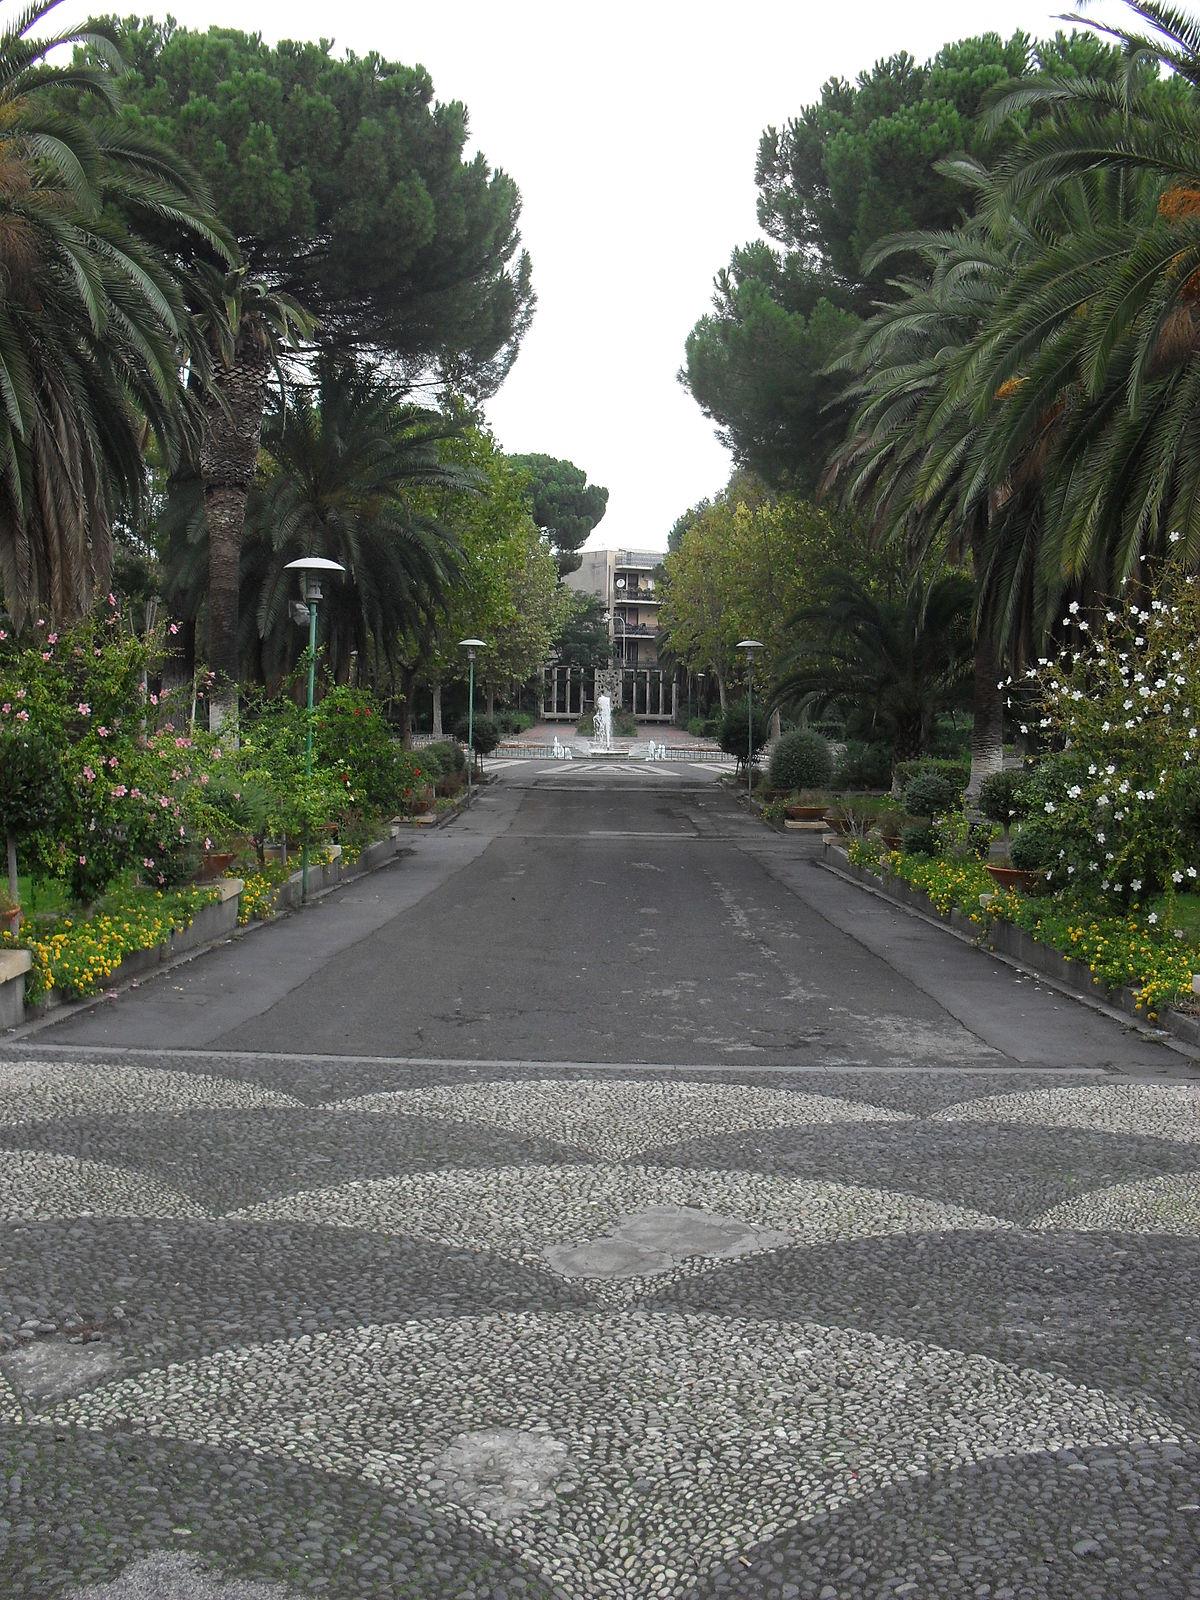 Creativo Tende Da sole Catania Galleria Di Tenda Idee